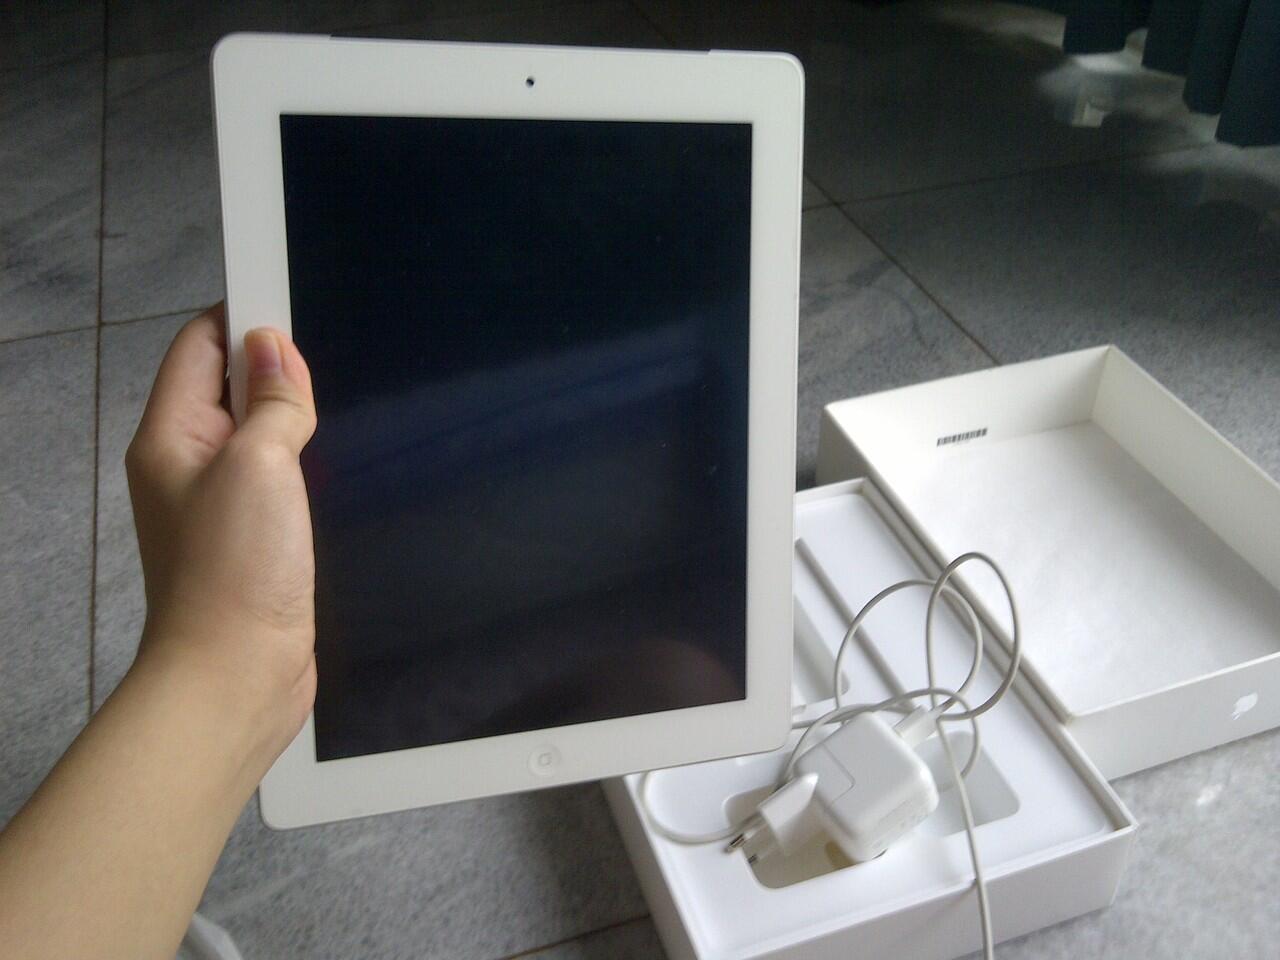 Ipad 2 3G Wifi White 16GB mulus 99% like a new